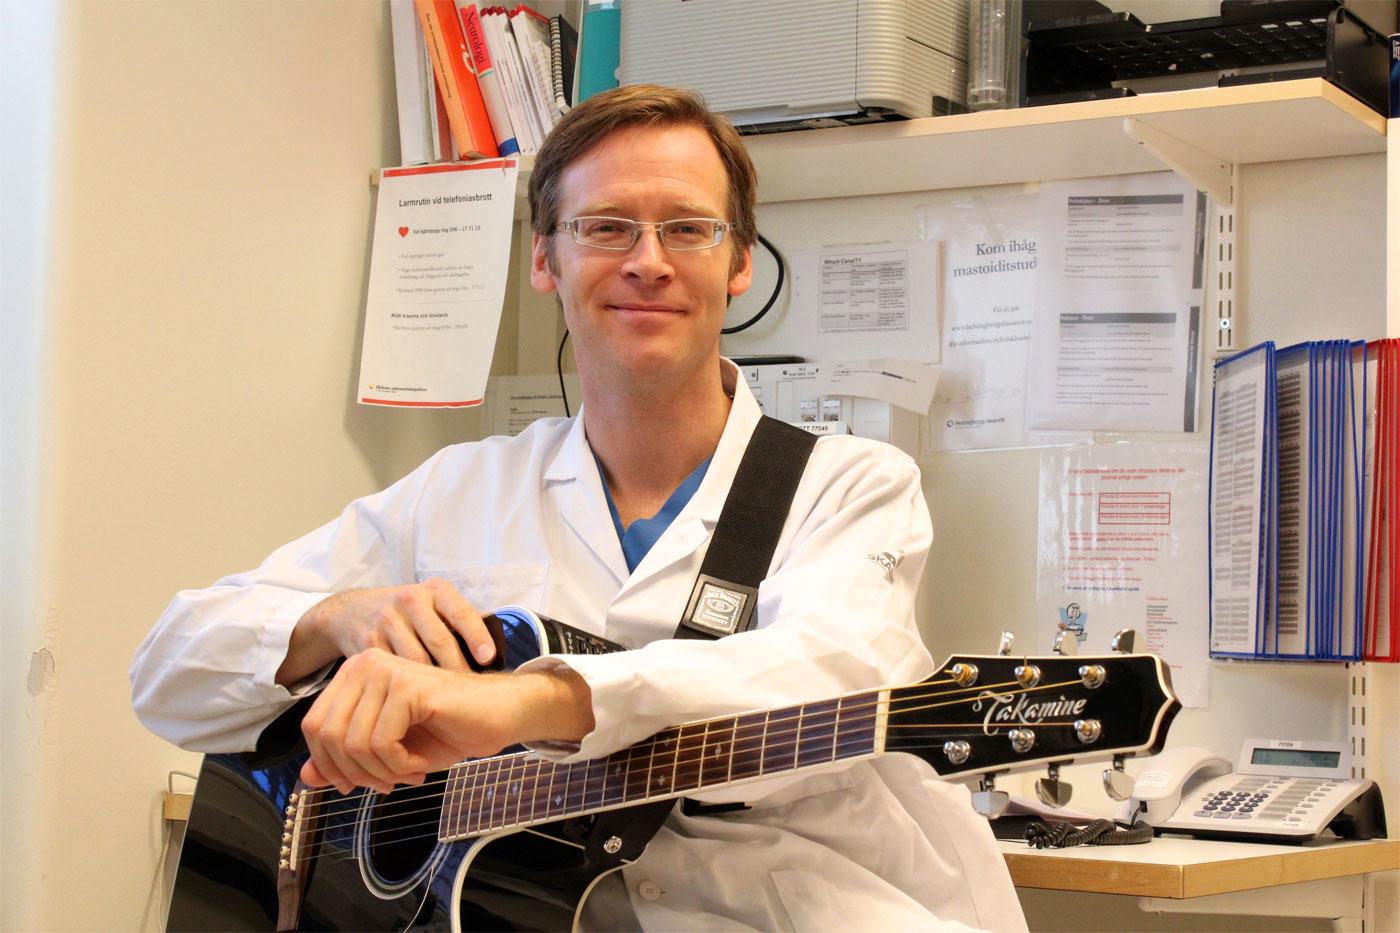 Henrik-Widegren